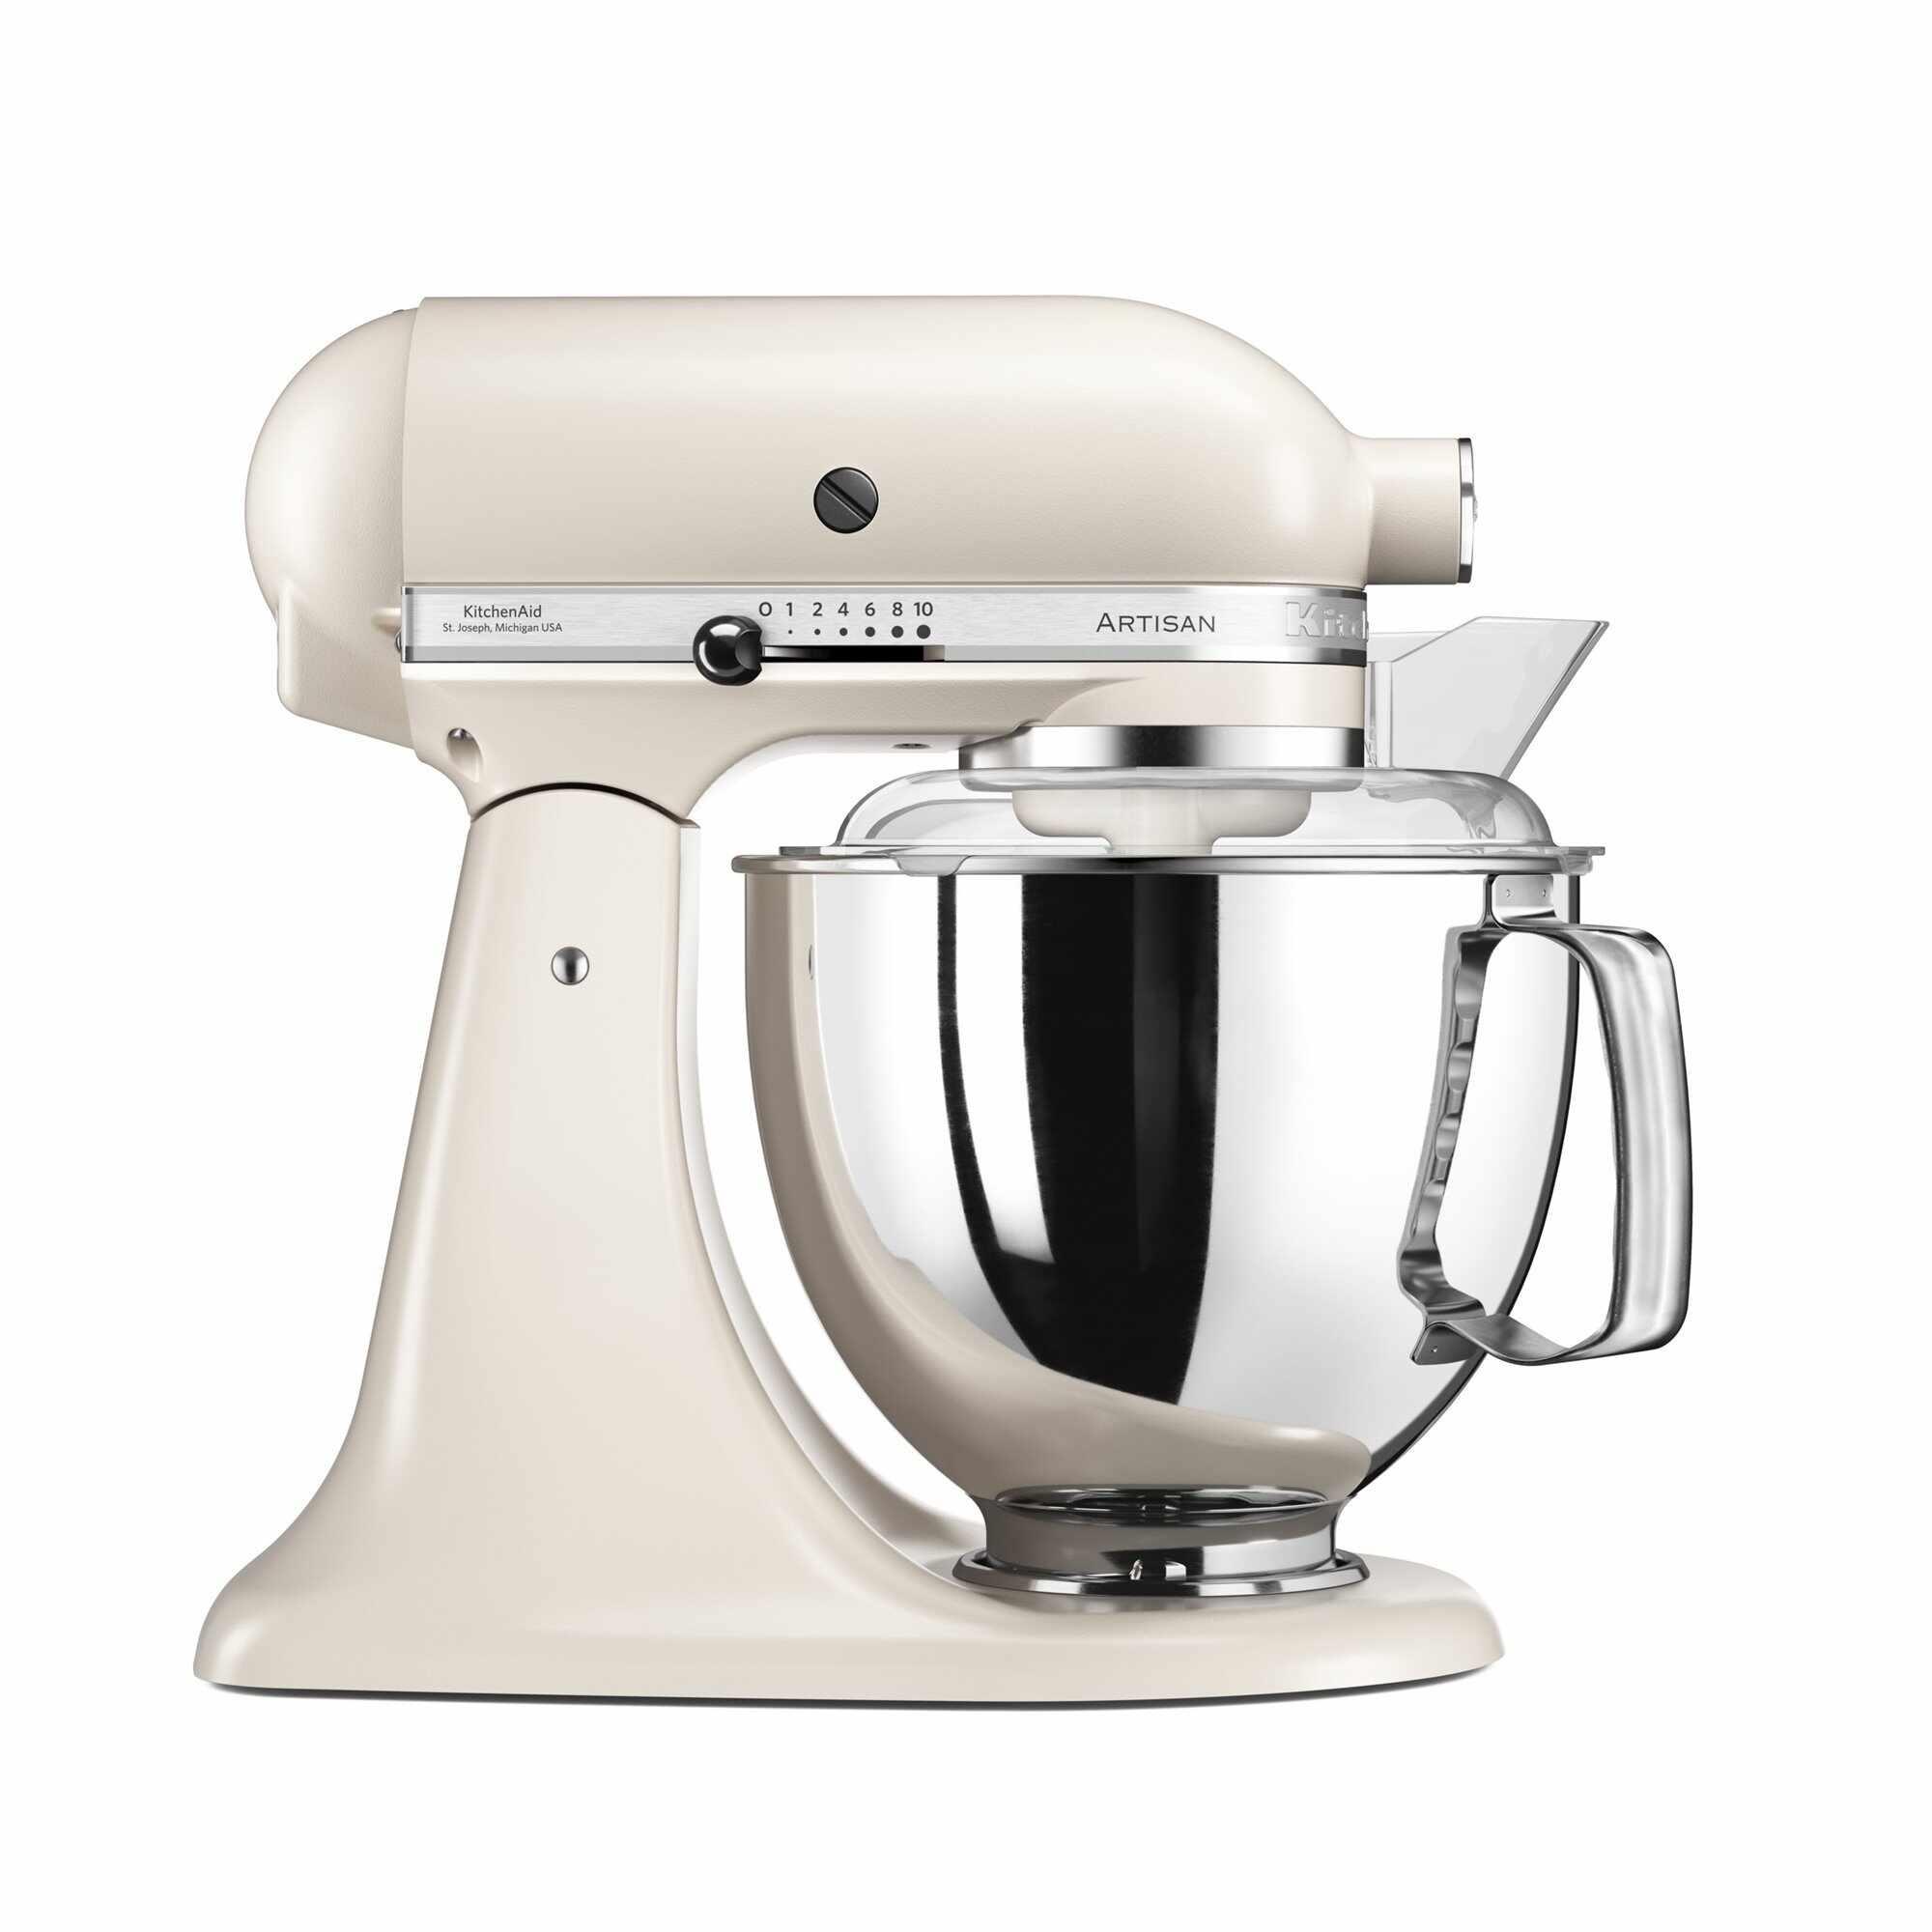 Mixer cu bol Artisan Elegance 5KSM175PSELT, 4,8 L, Cafe Latte, 300W, KitchenAid la pret 2899 lei